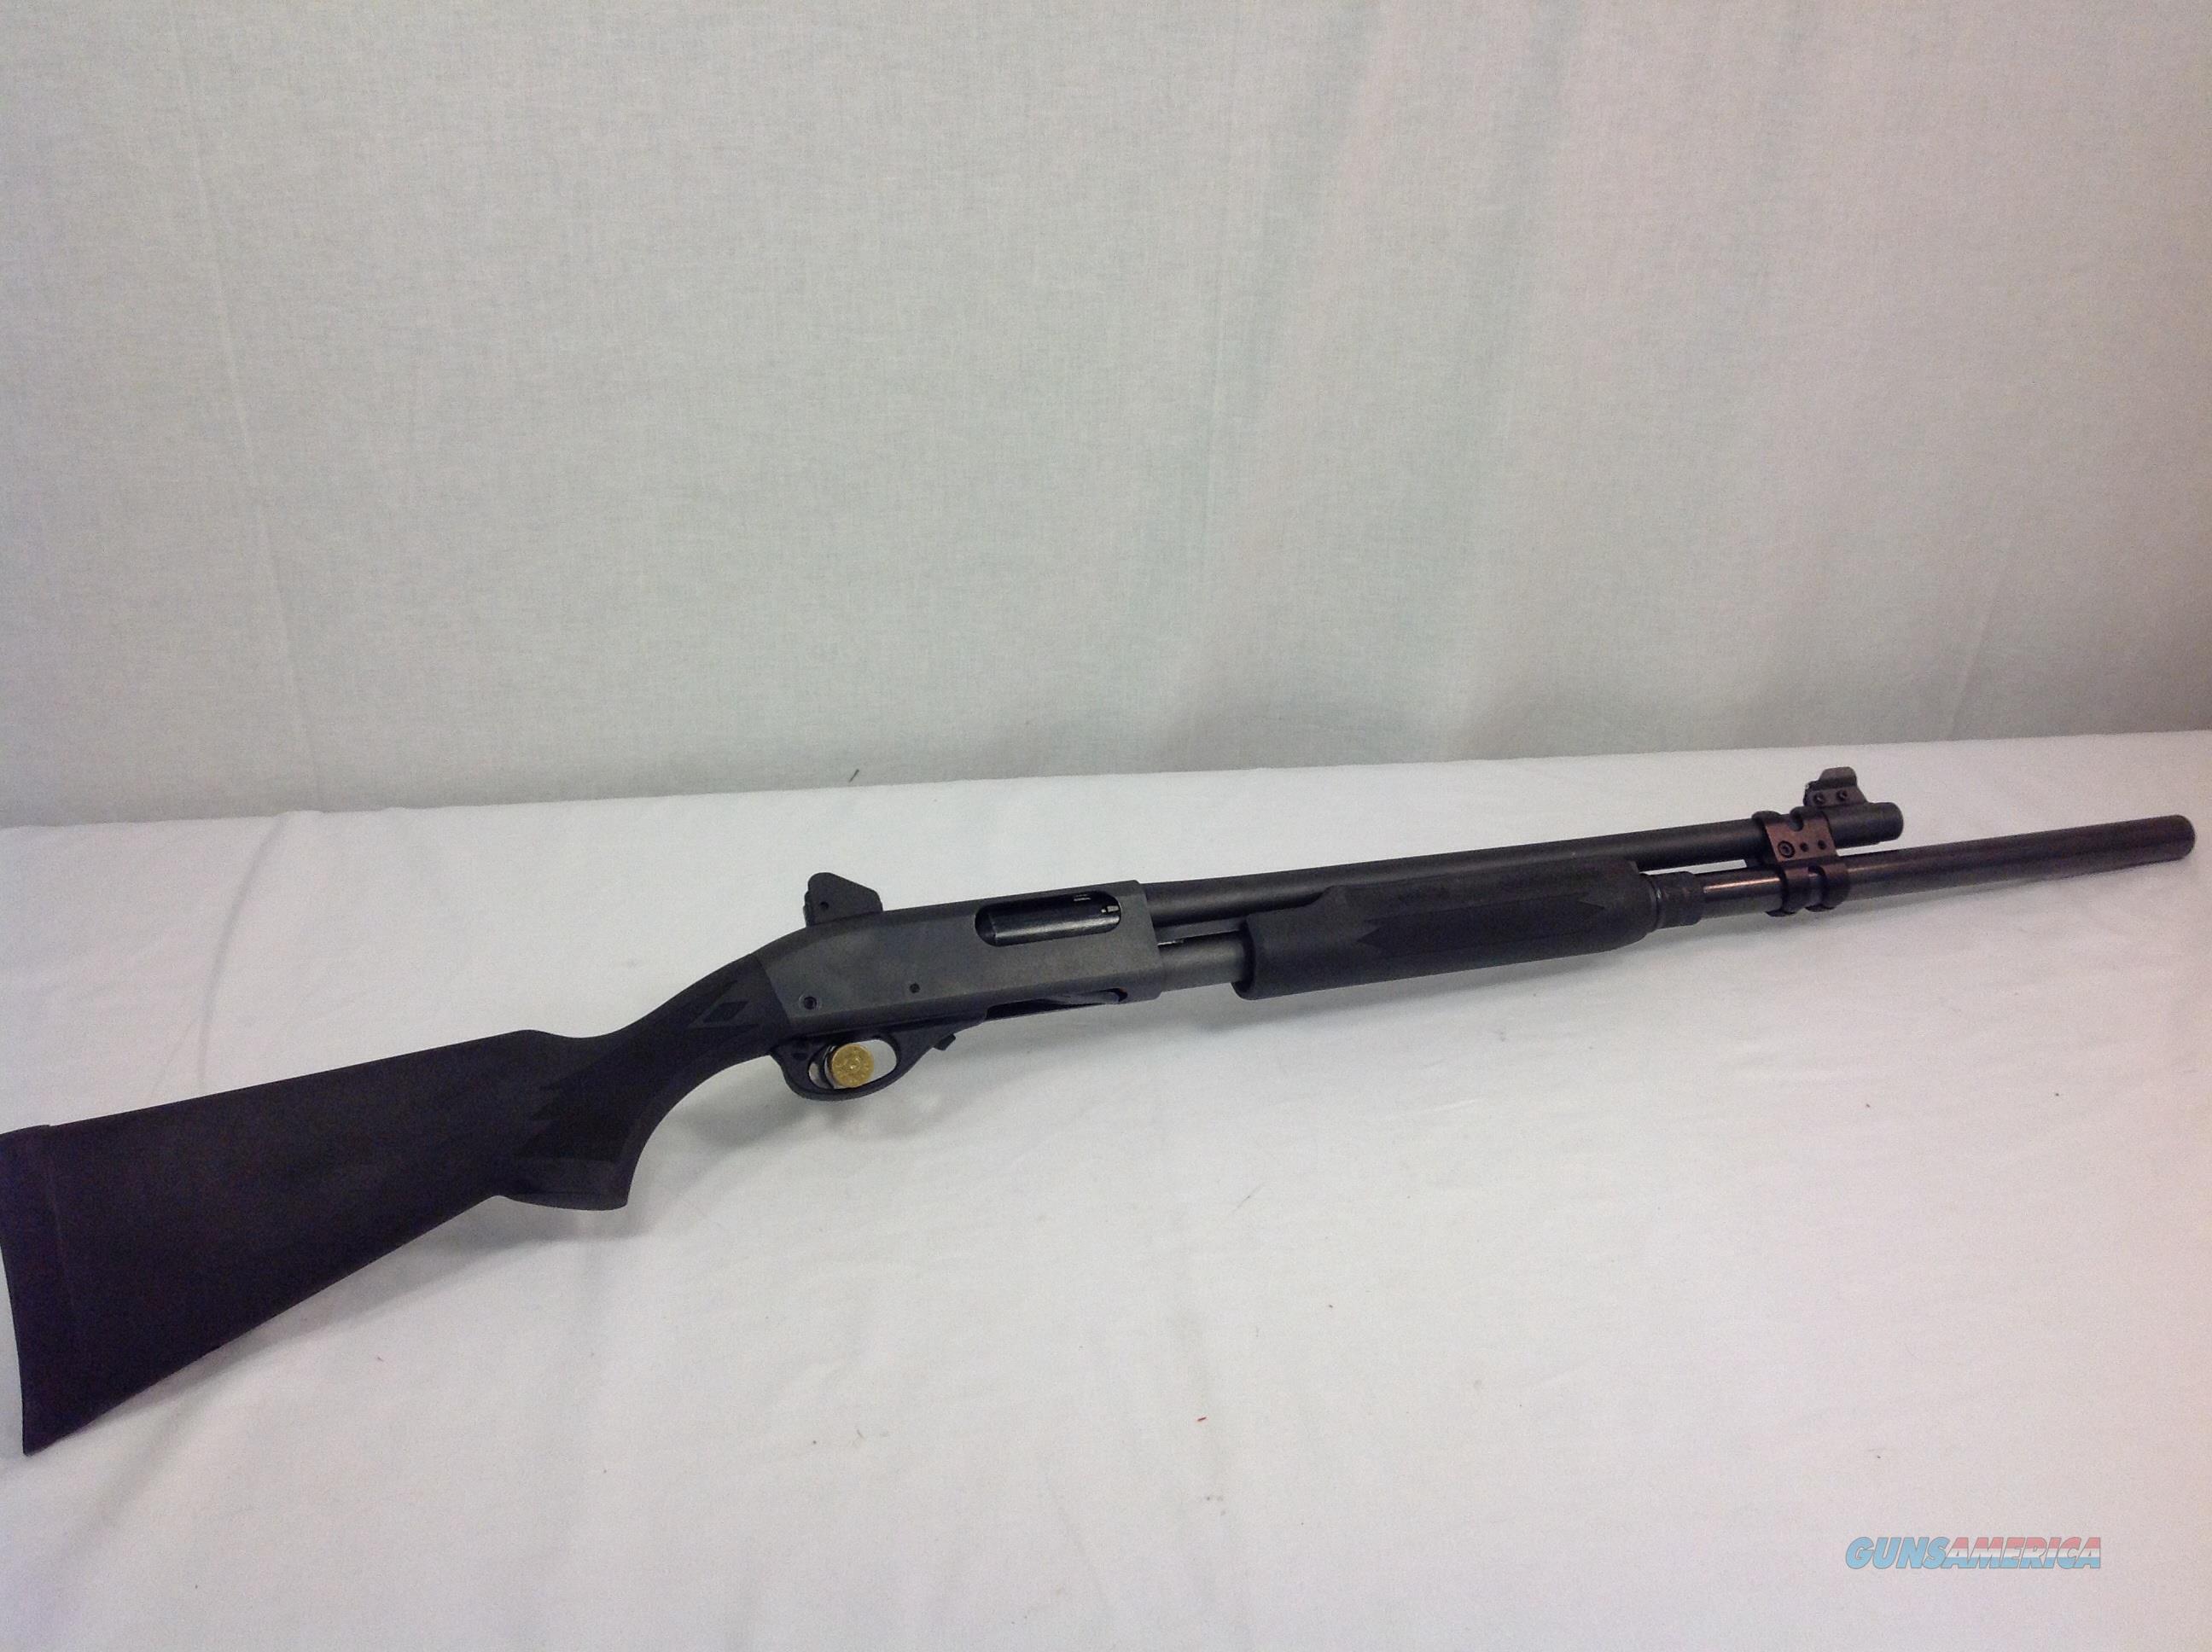 3-gun | Remington 870, Accessories, Upgrades, Tactical, Reviews, Forum